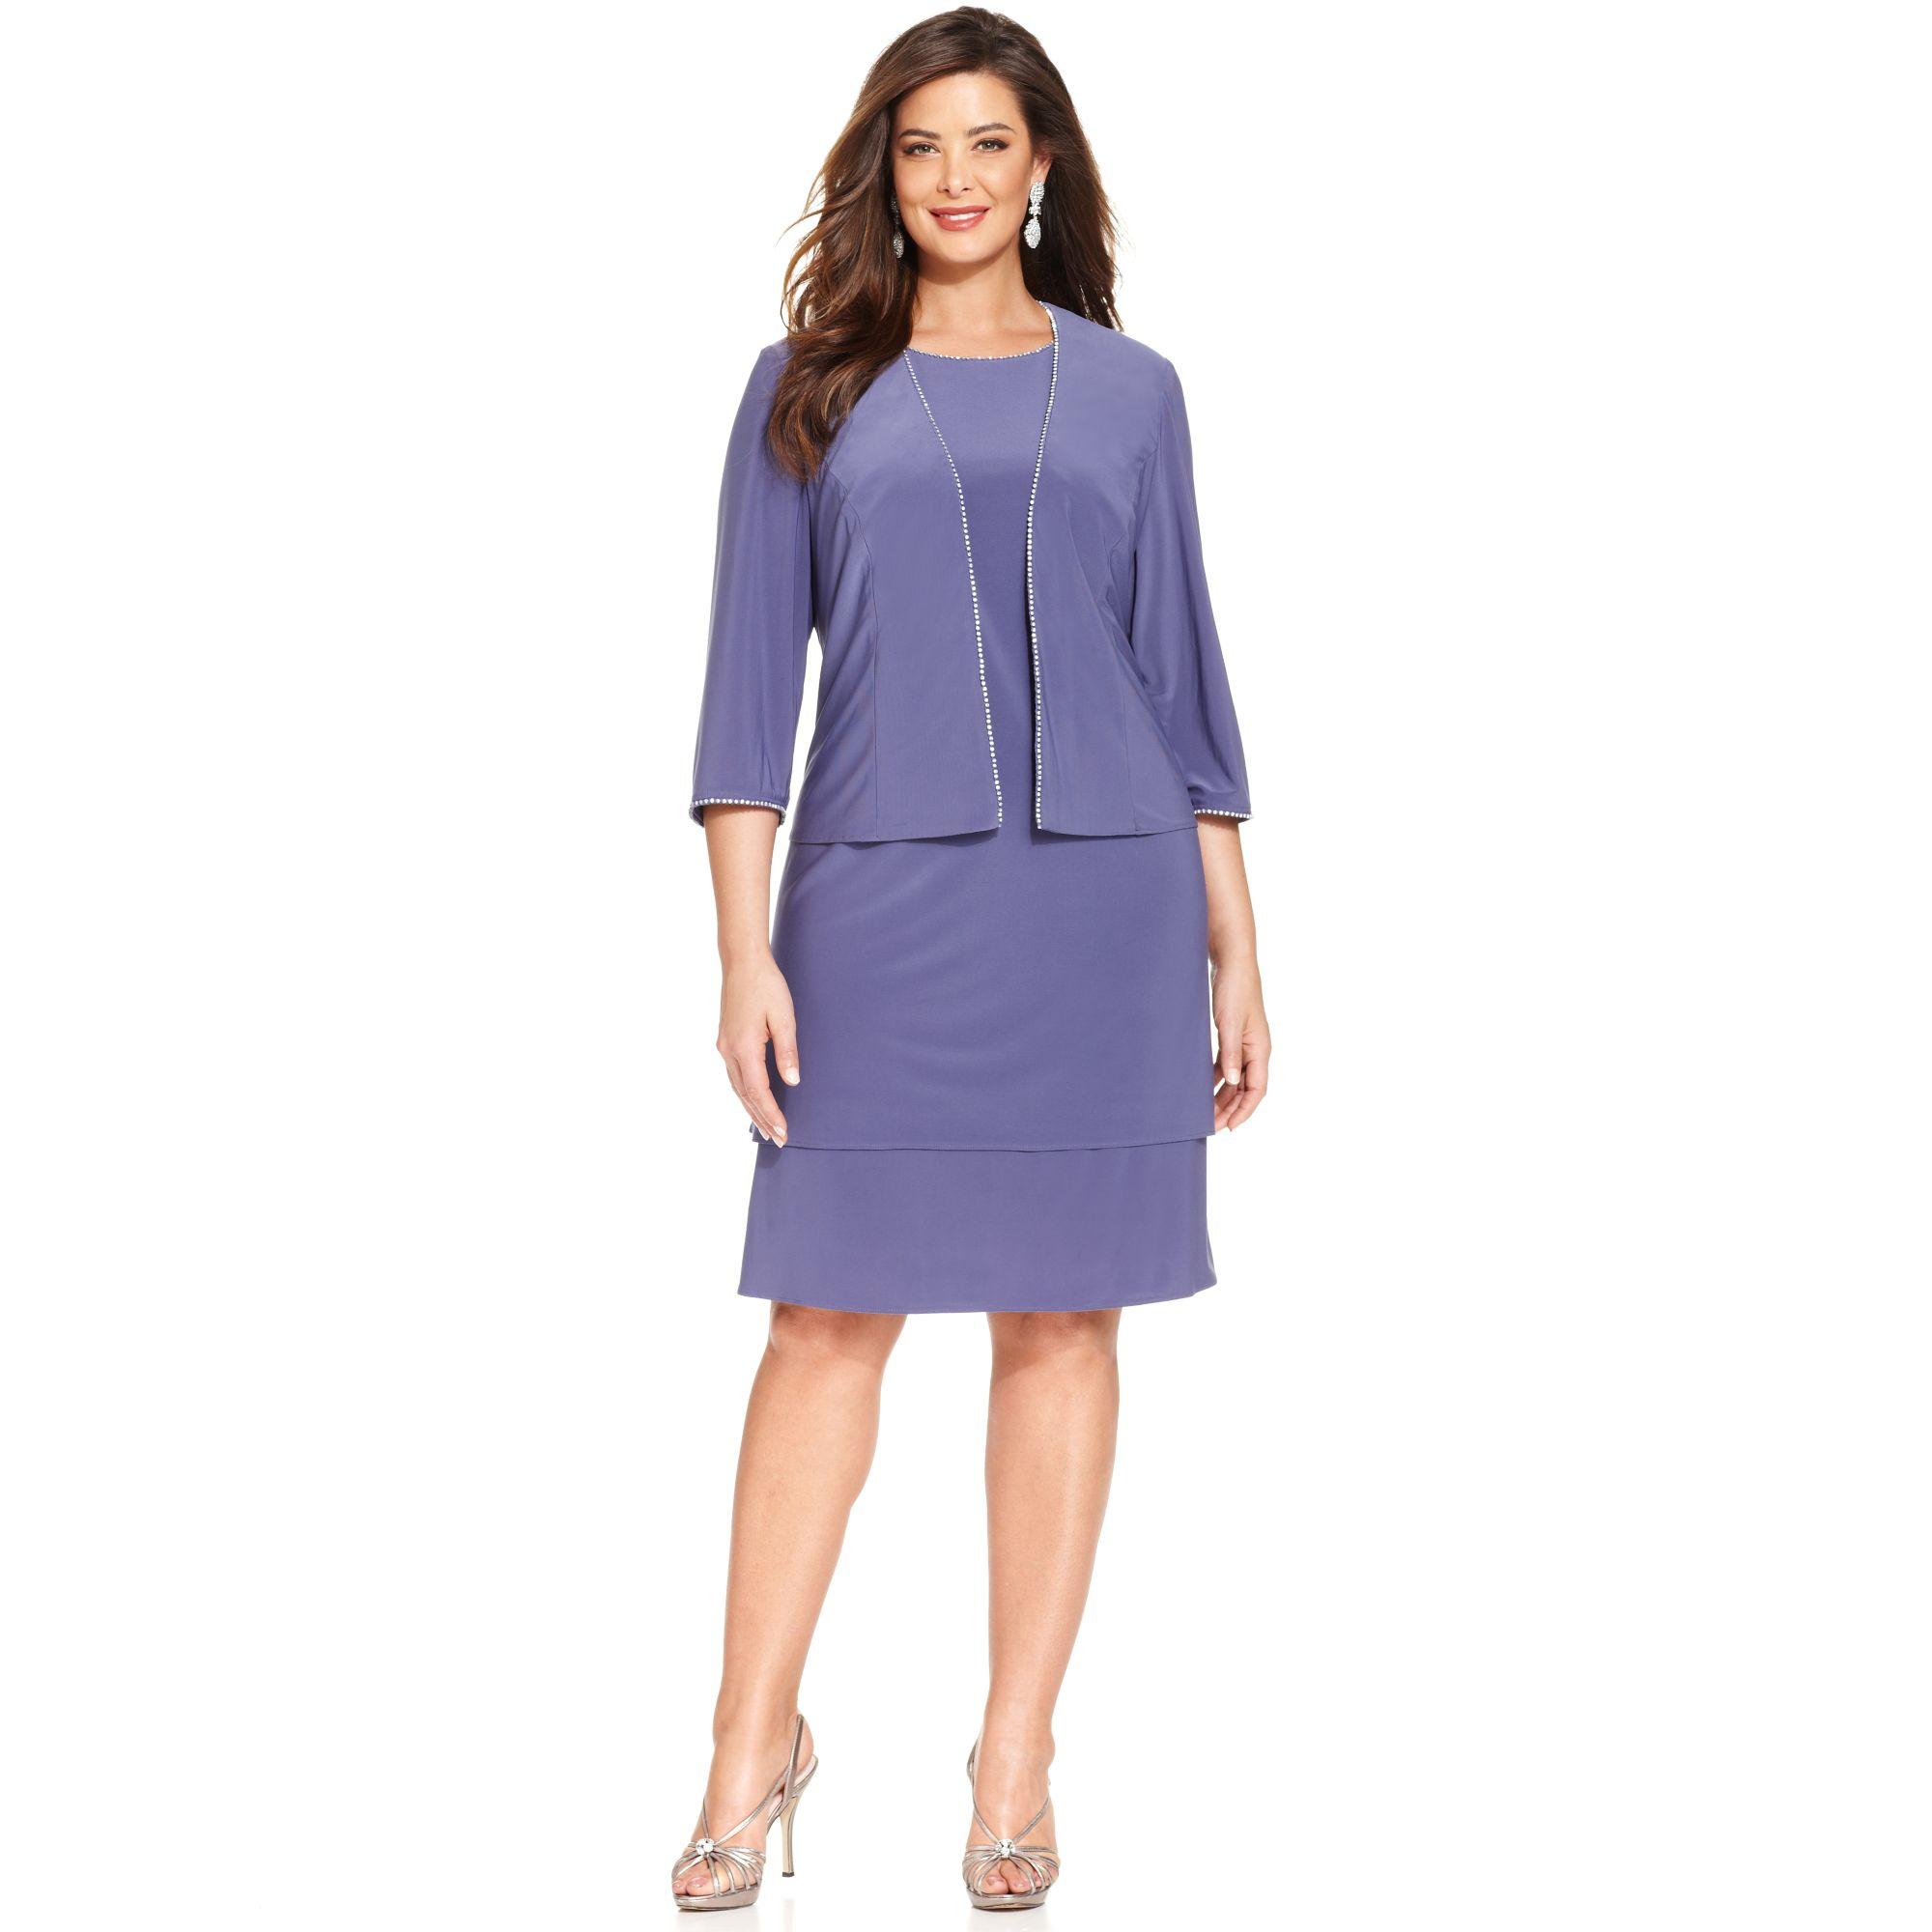 Evening Jacket Dresses Plus Size - Plus Size Prom Dresses